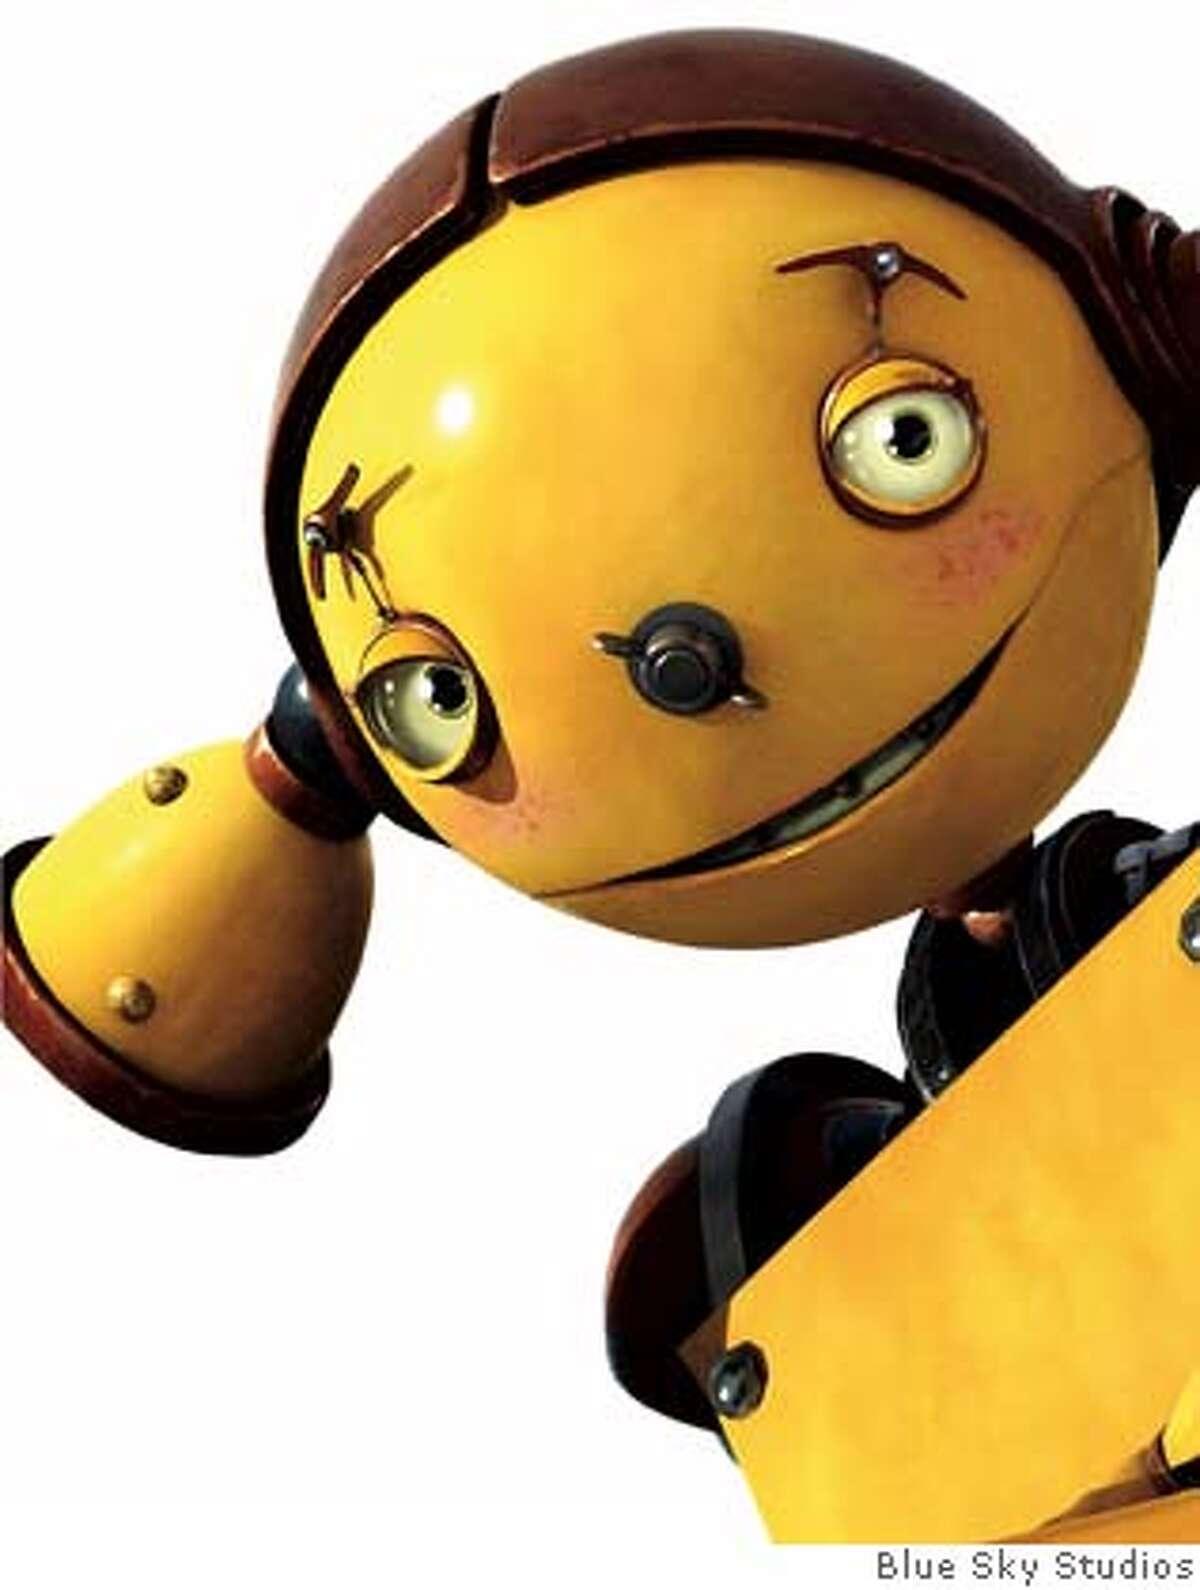 Piper Pinwheeler is voiced by Amanda Bynes. Image courtesy of Blue Sky Studios